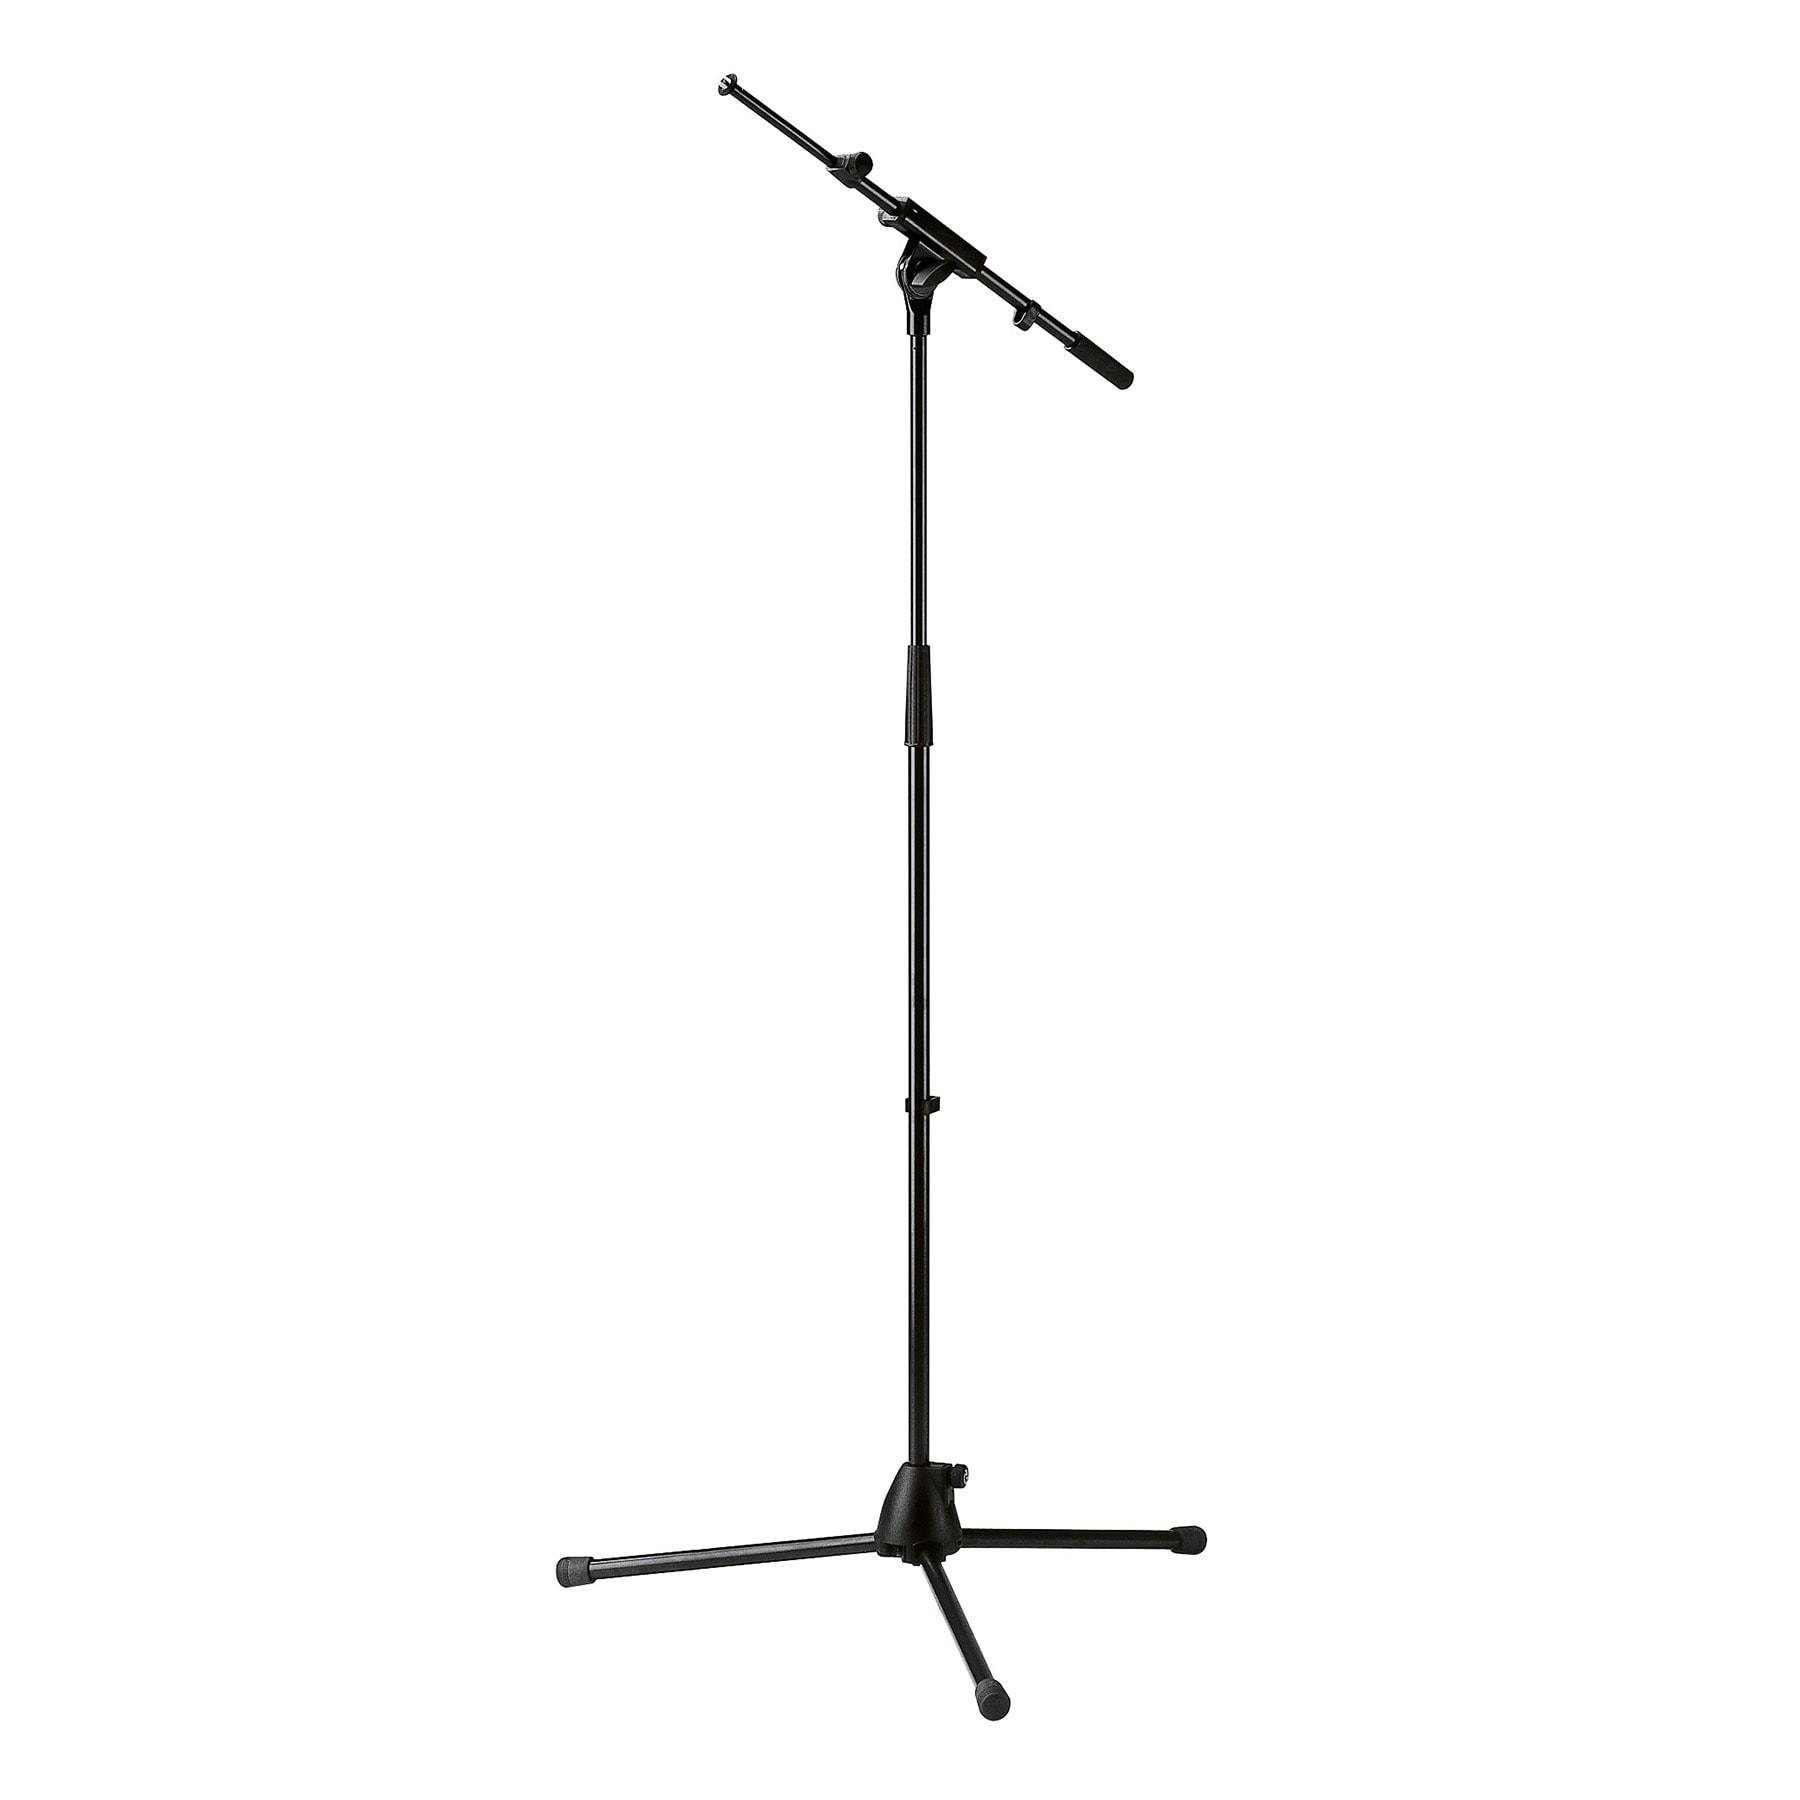 KM27195 - Microphone stand